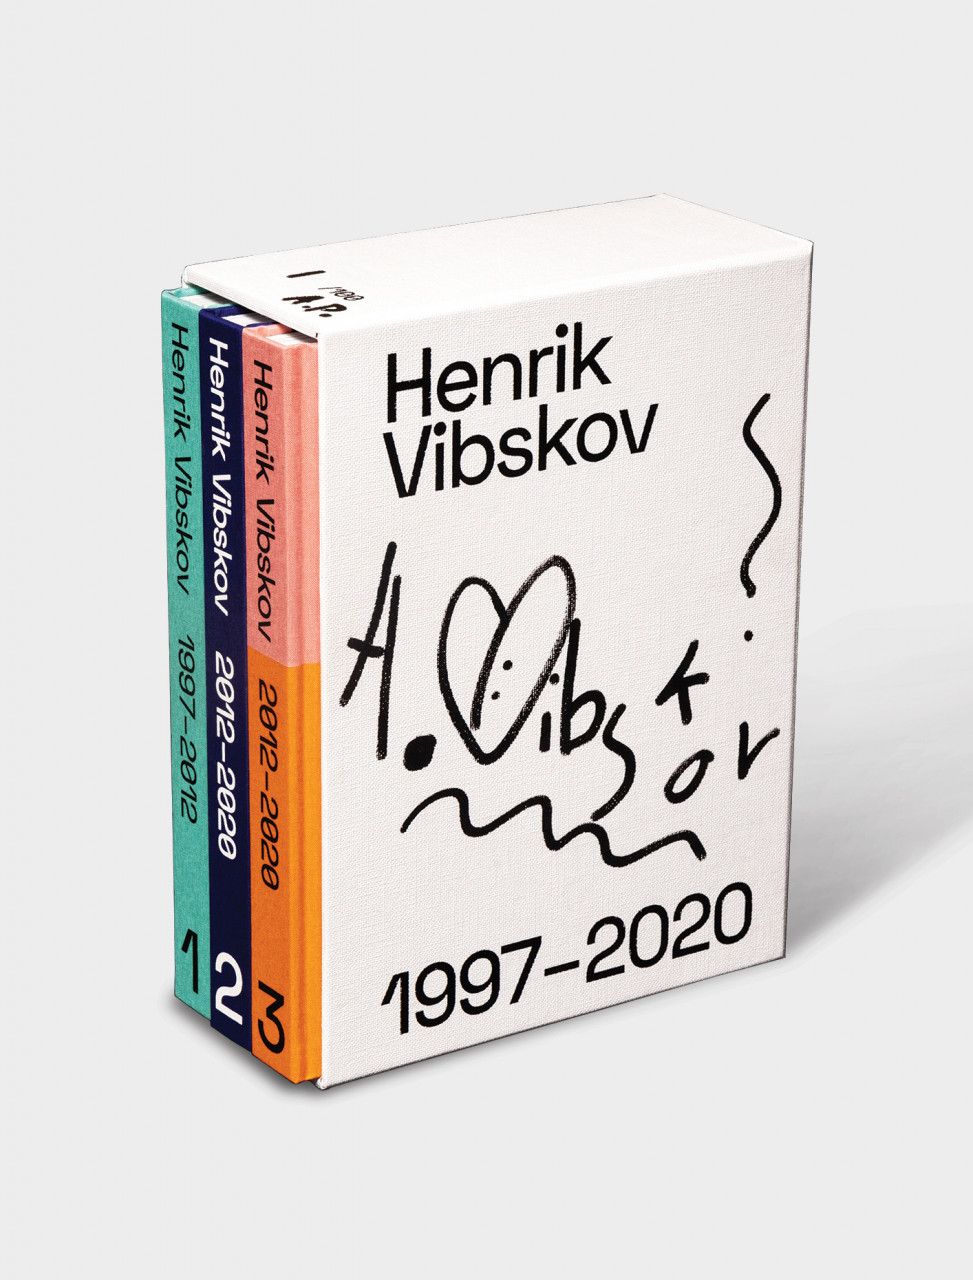 1001153 HENRIK VIBSKOV LIMITED SIGNED BOX EDITION